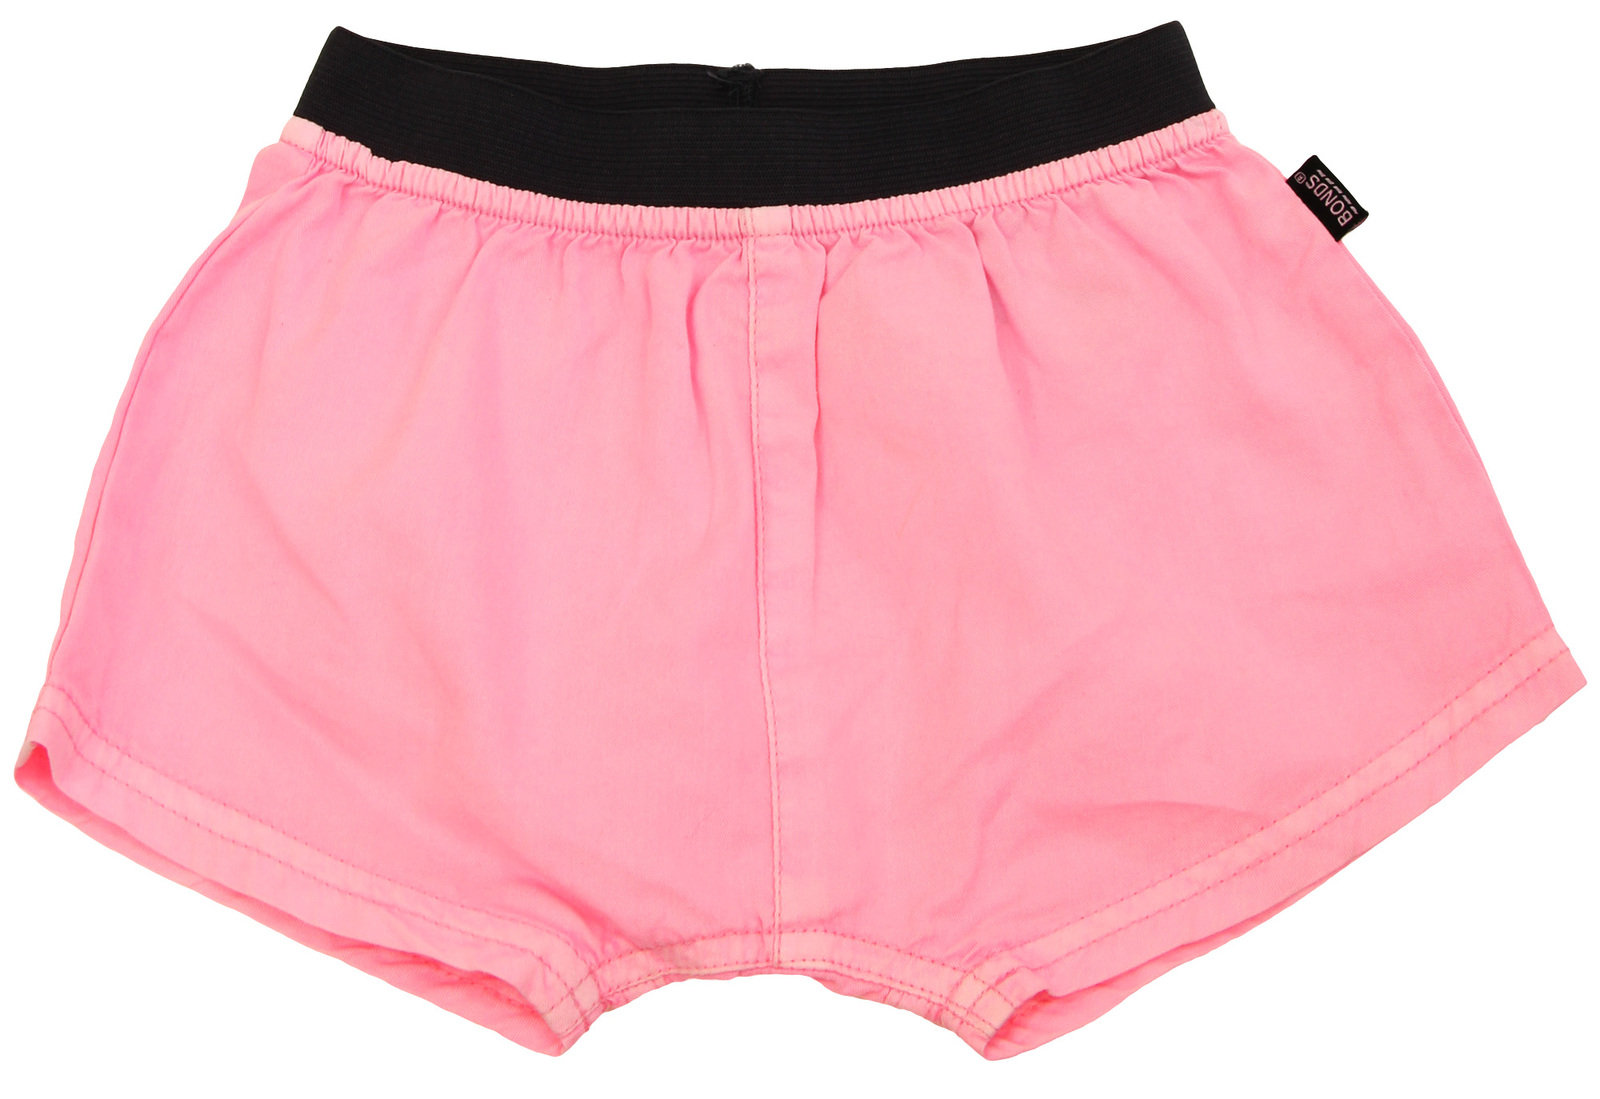 Bonds Beachies Shorts - Strawberry Glaze (18-24 Months) image